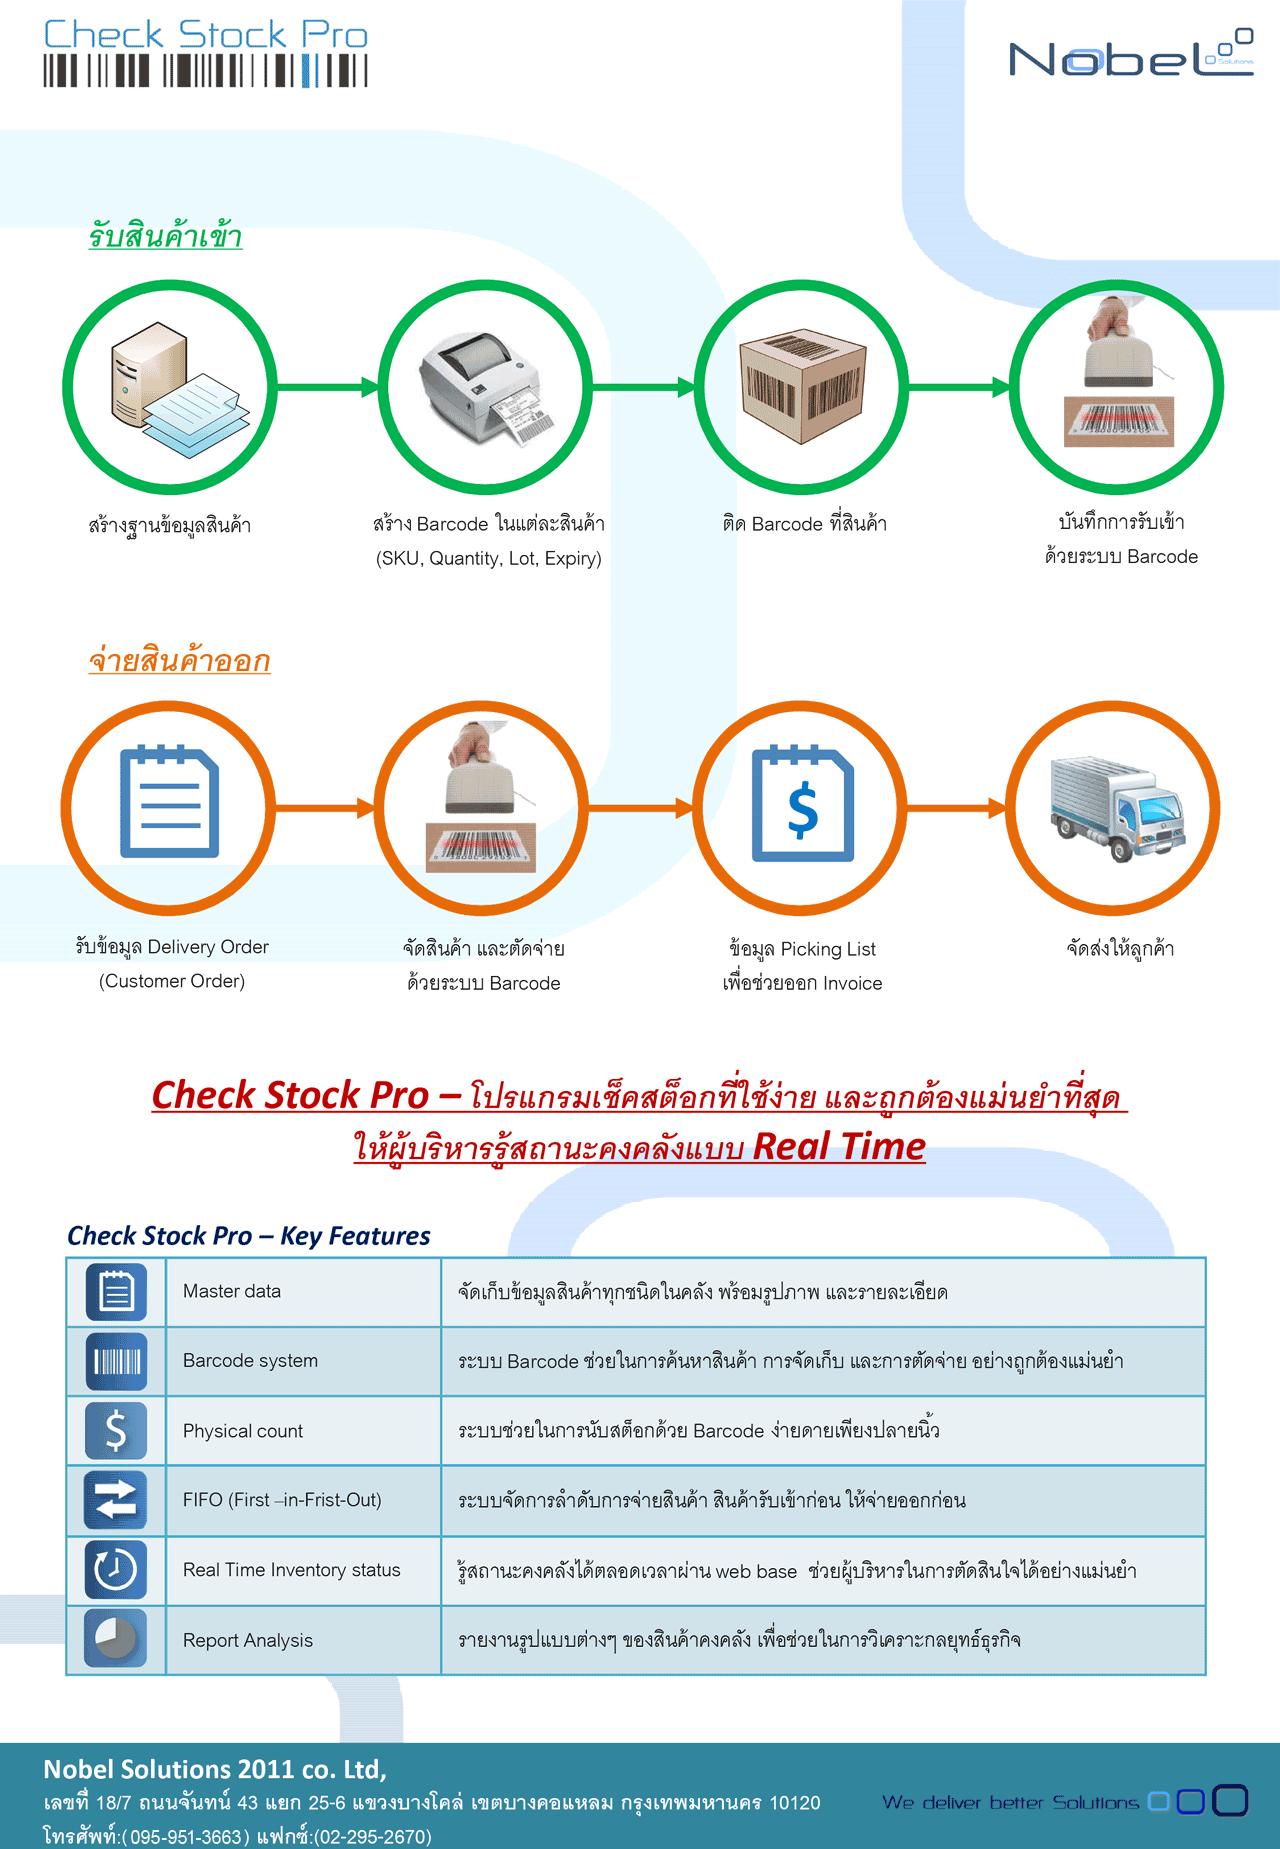 checkstockpro เช็คสต๊อกสินค้าคงคลังอย่างมืออาชีพ